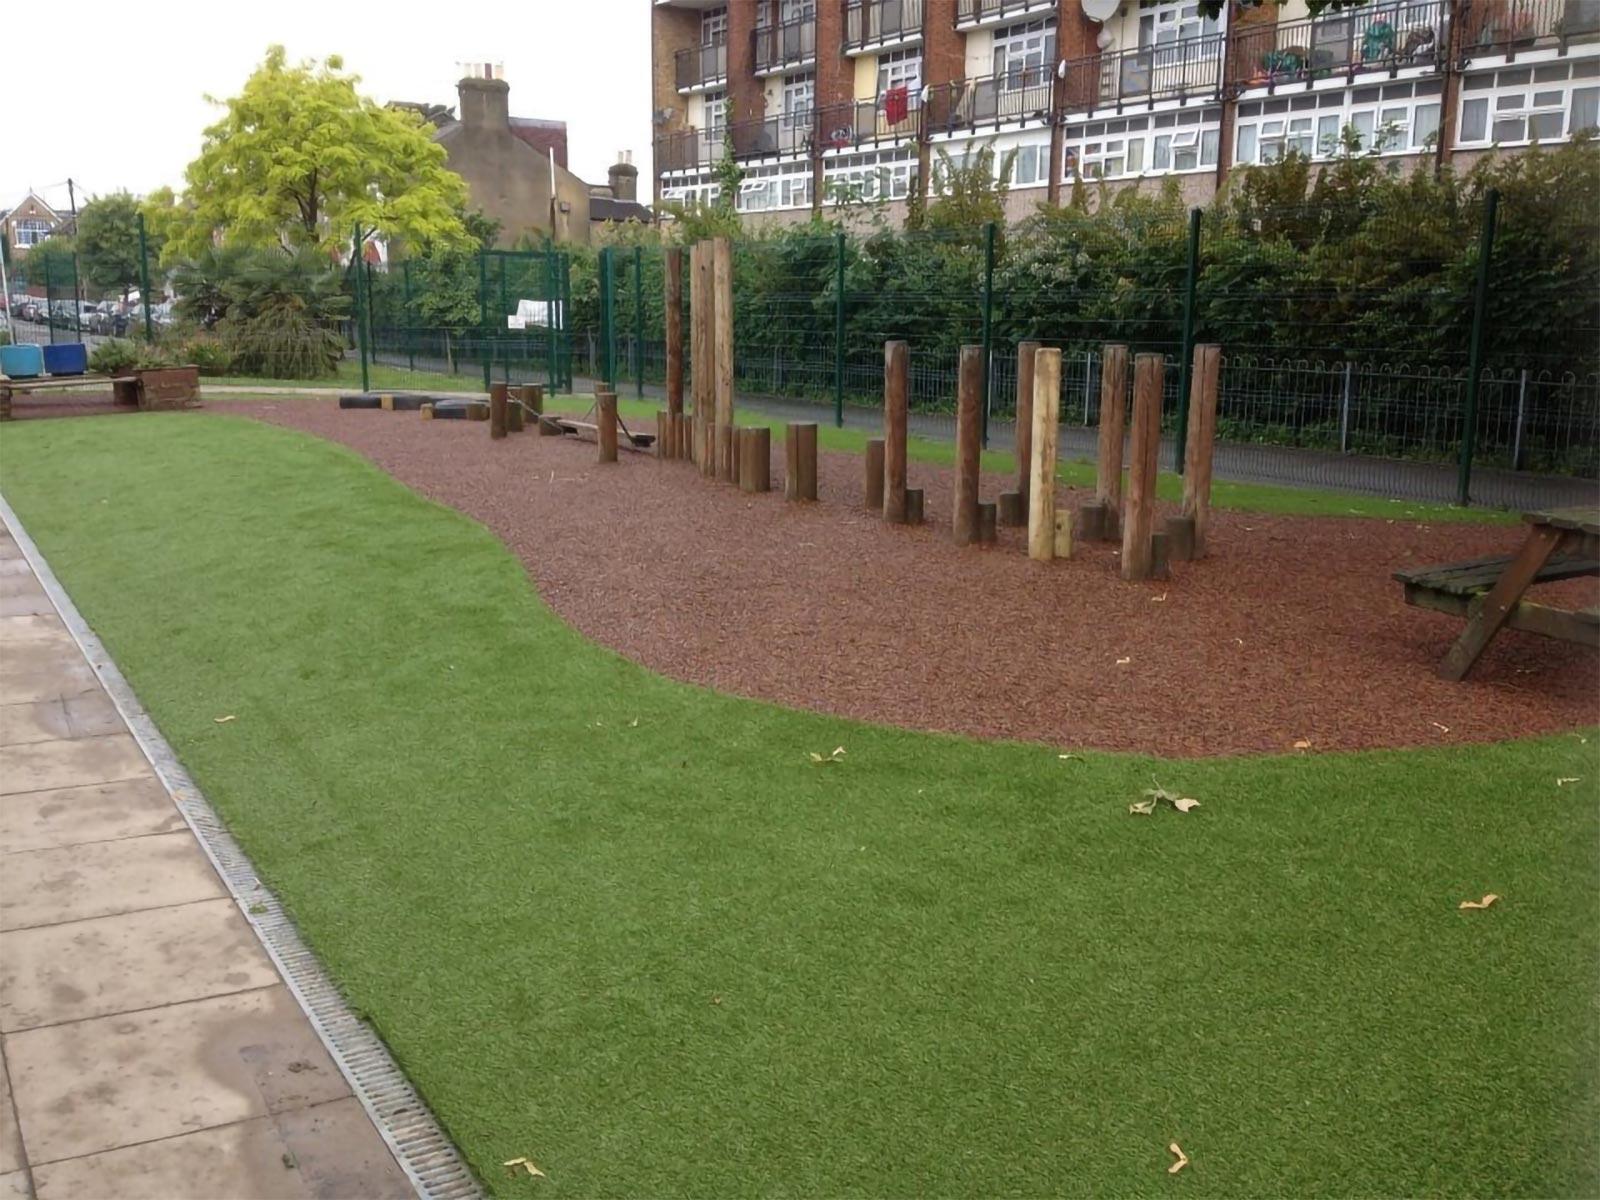 rubber mulch and artificial grass